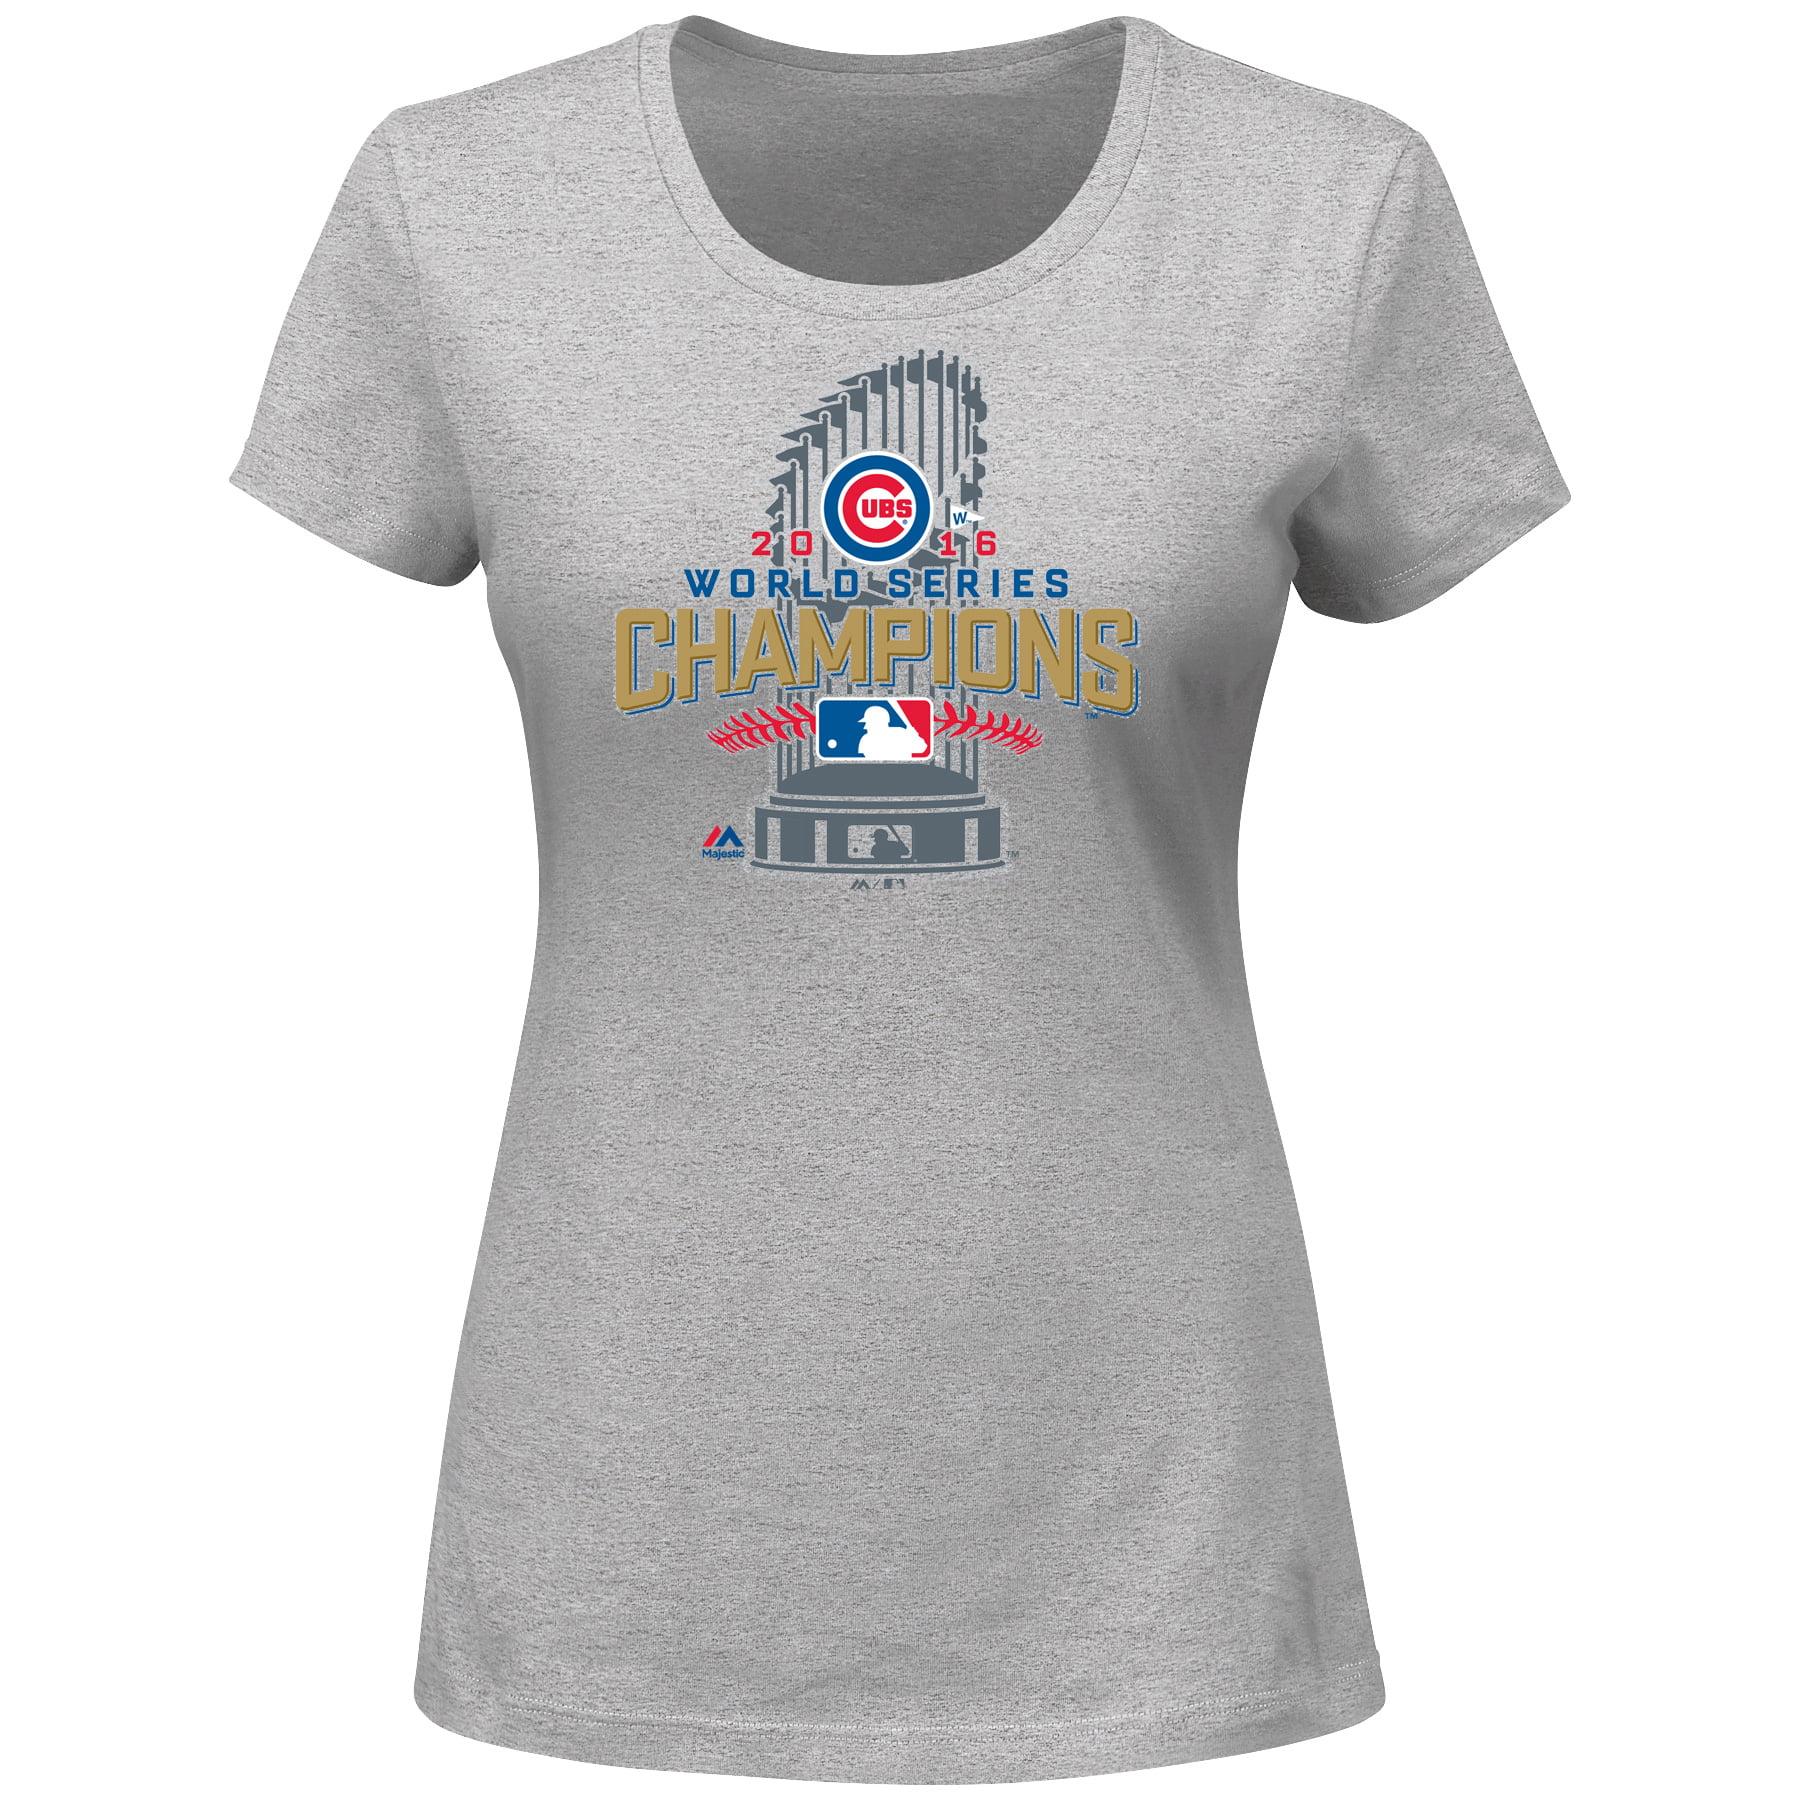 Chicago Cubs Majestic Women's 2016 World Series Champions Locker Room T-Shirt - Gray